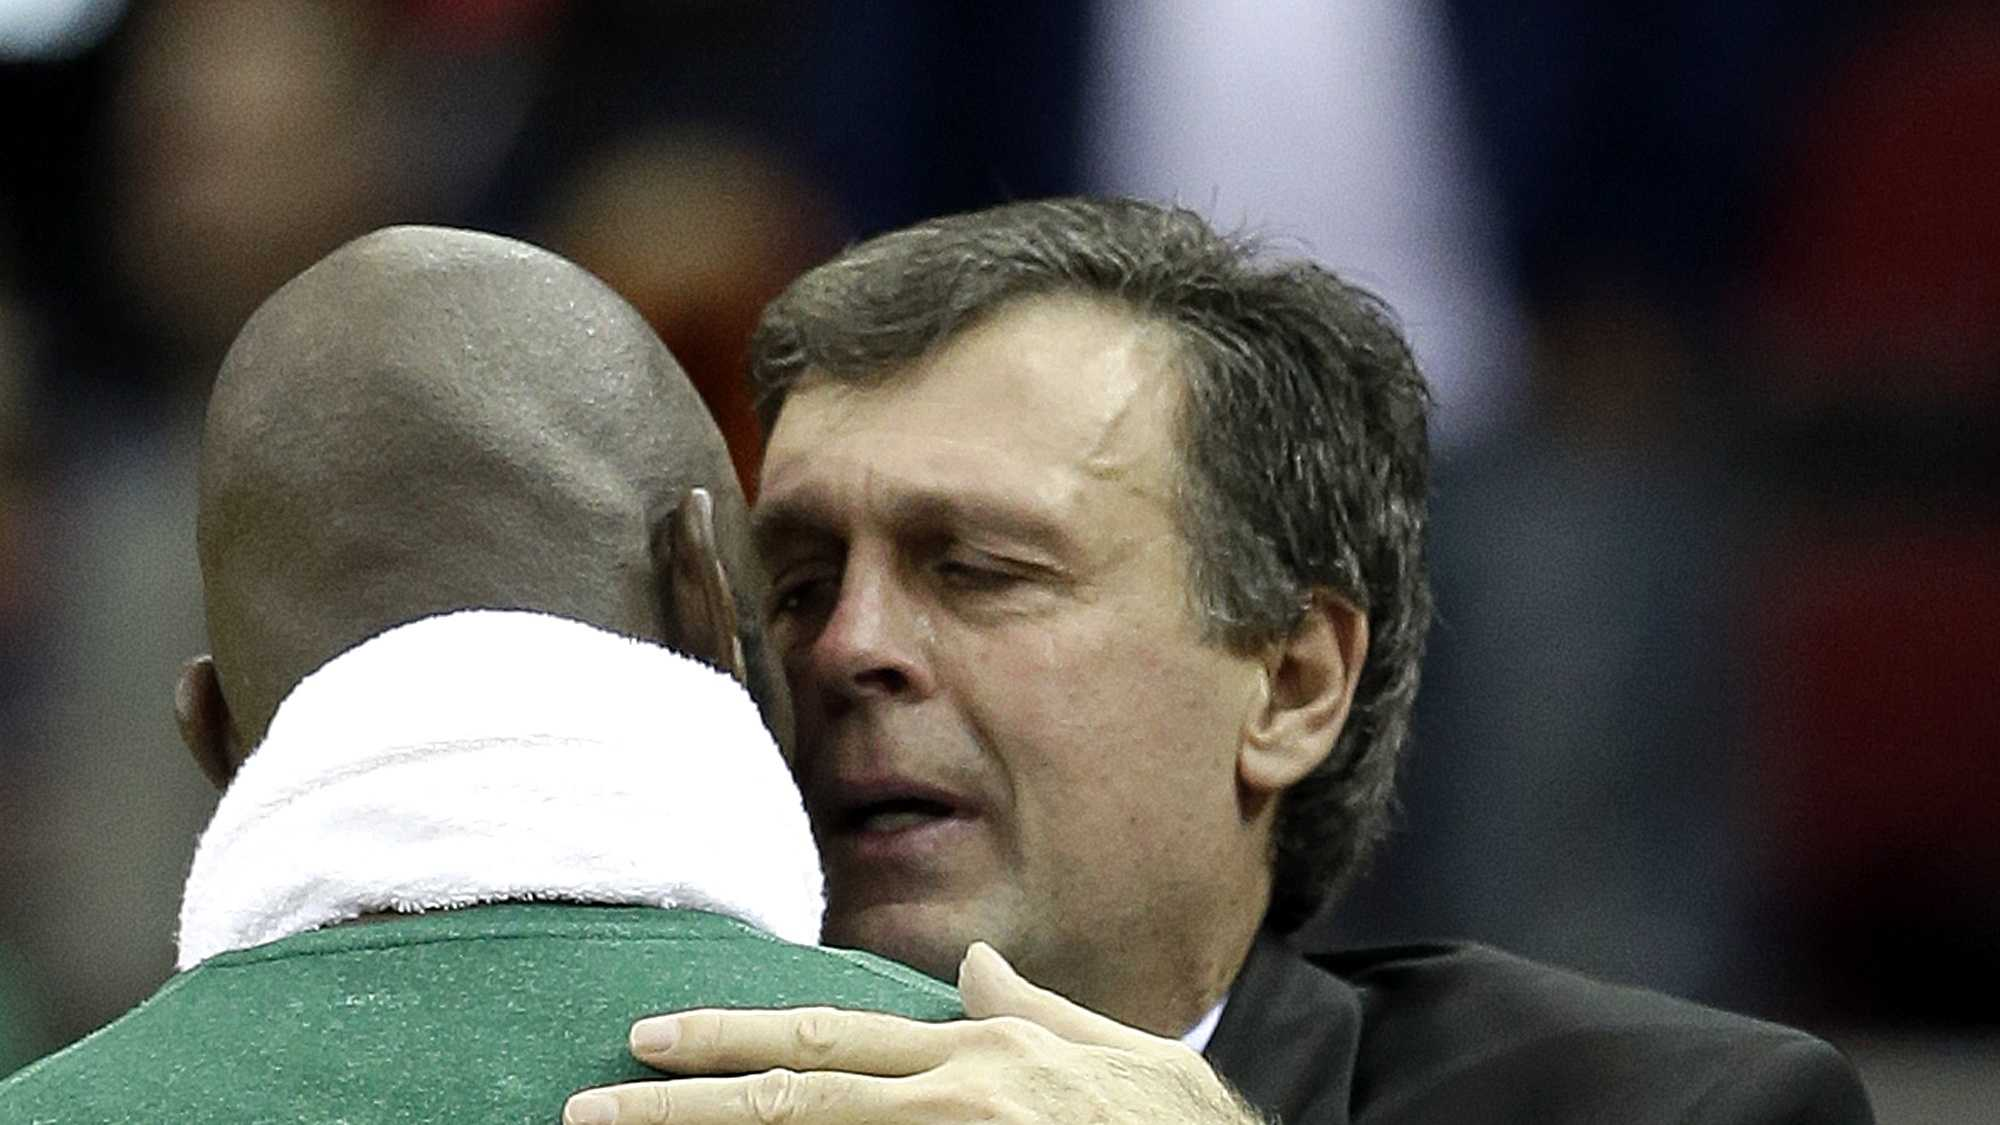 Garnett McHale Embrace